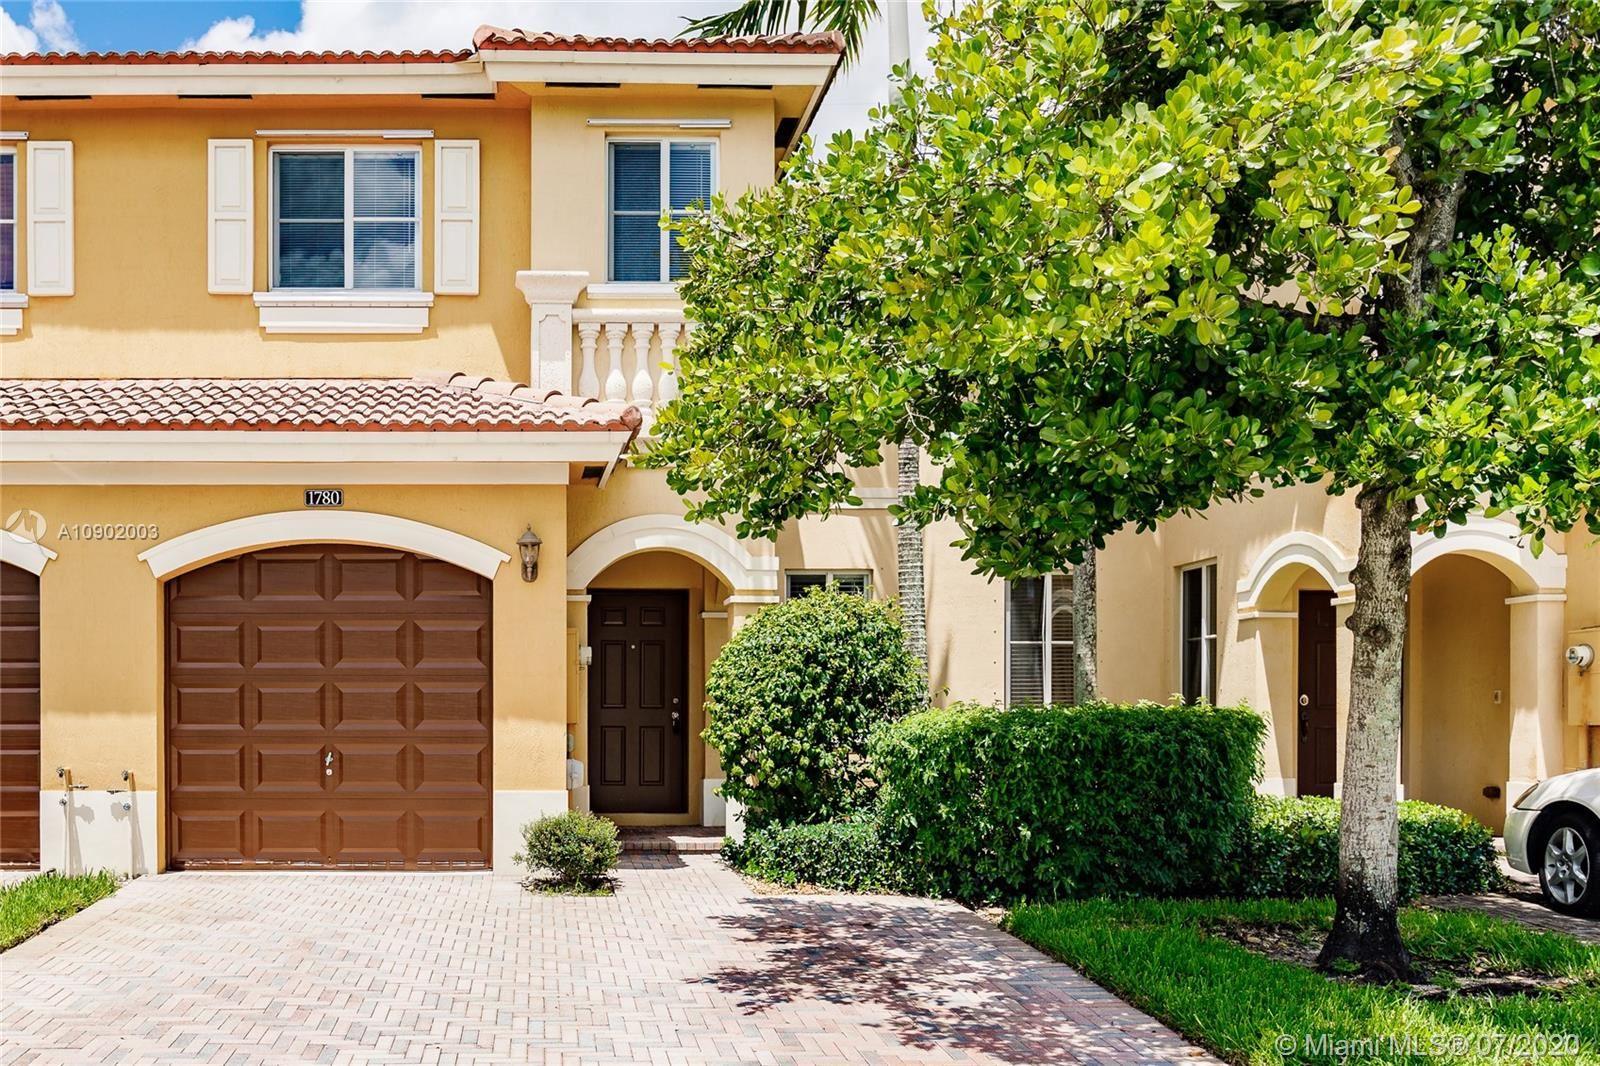 1780 SW 91st Ave #1780, Miramar, FL 33025 - #: A10902003